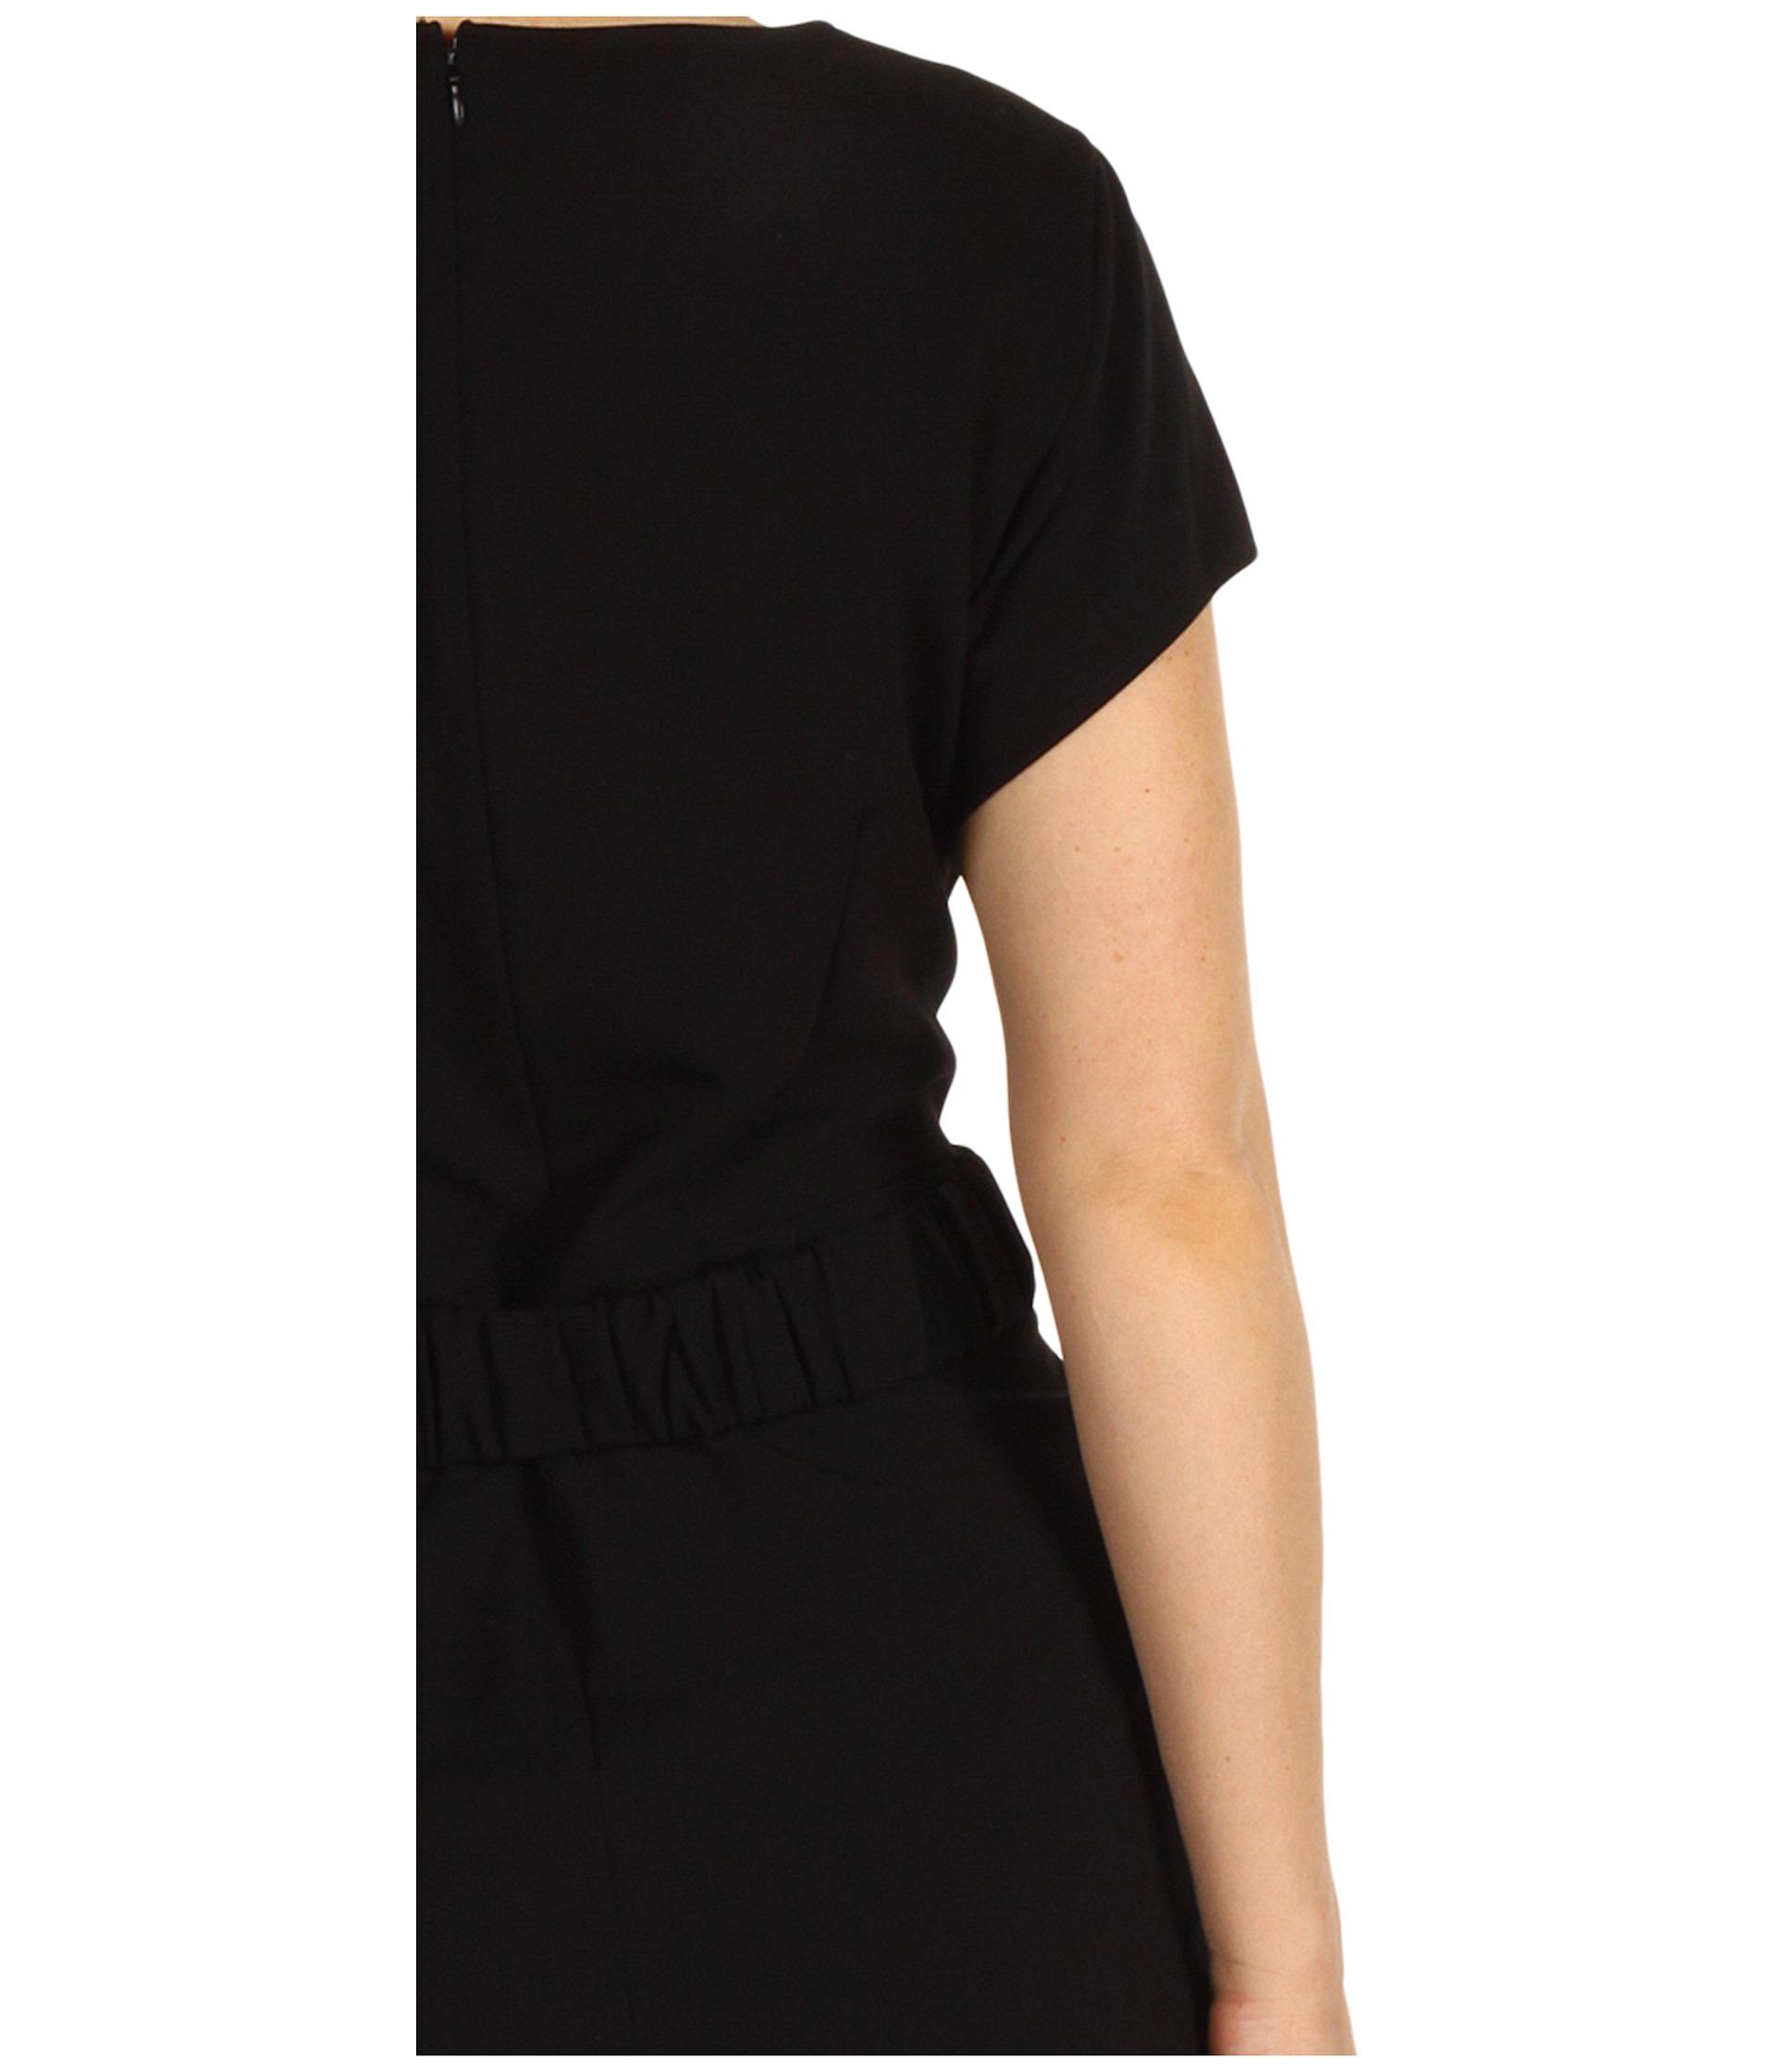 calvin klein plus size belted dress black, Clothing, Women at